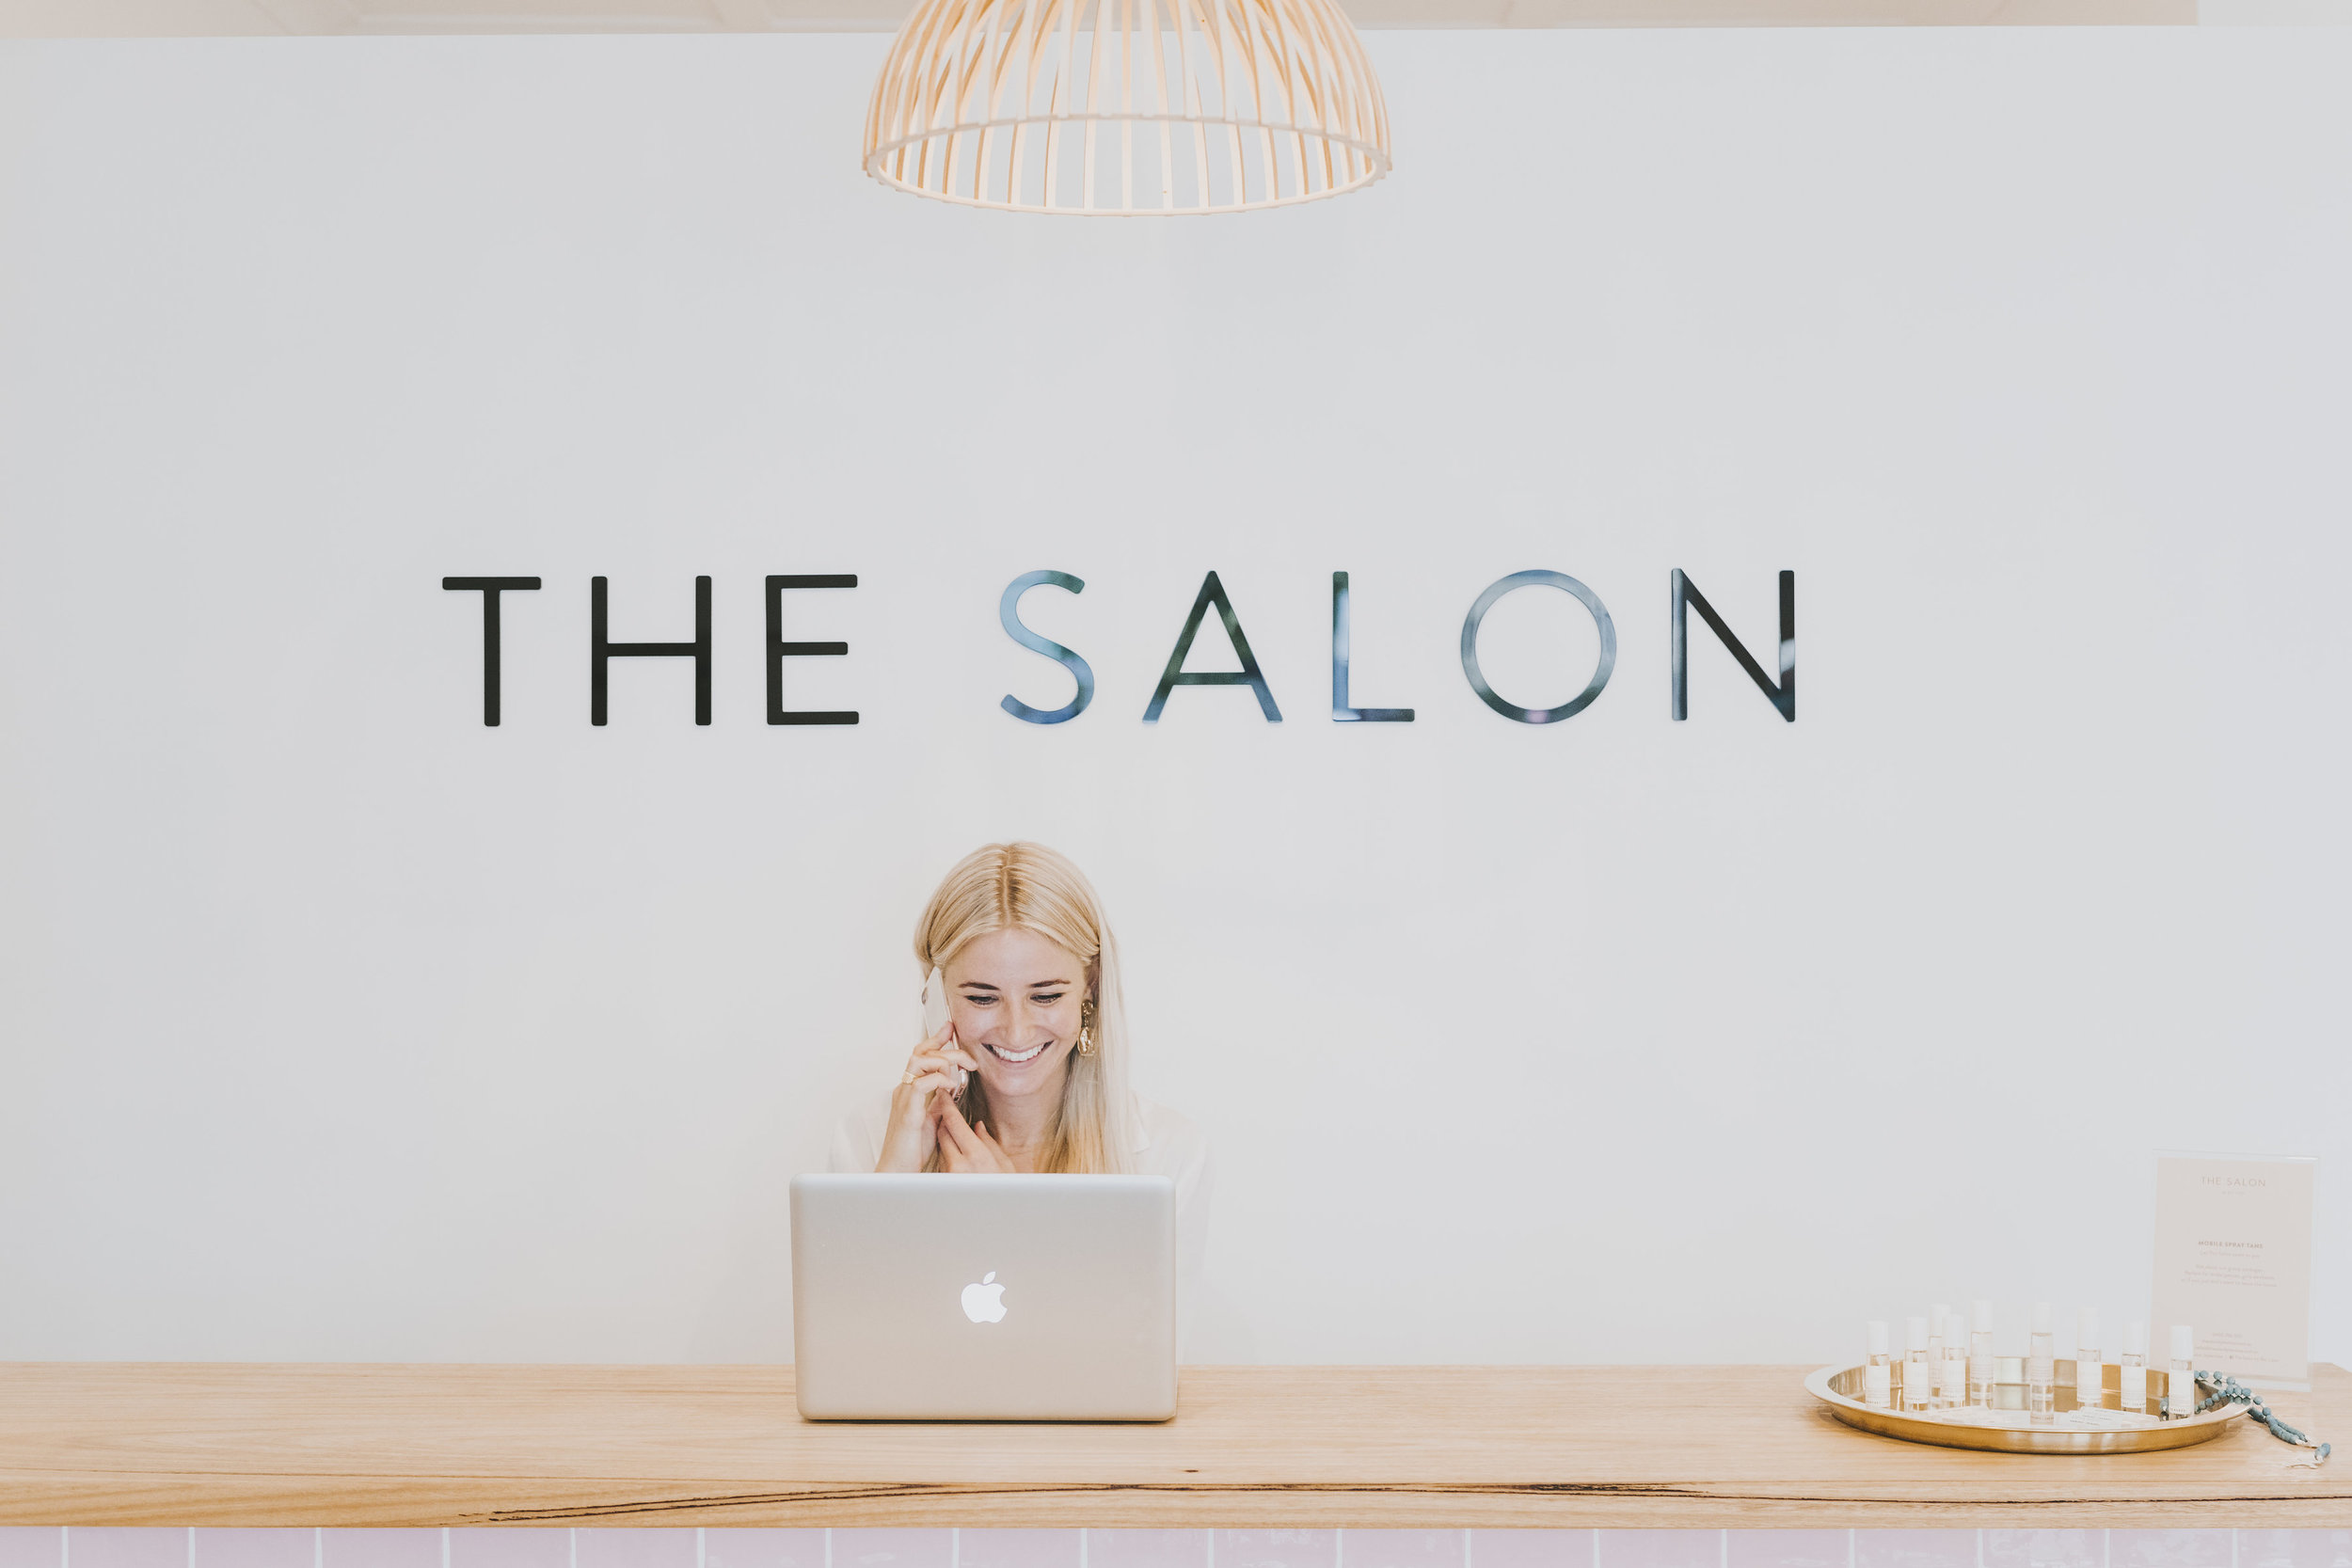 The-Salon-Coledale-Beauty-0089.jpg